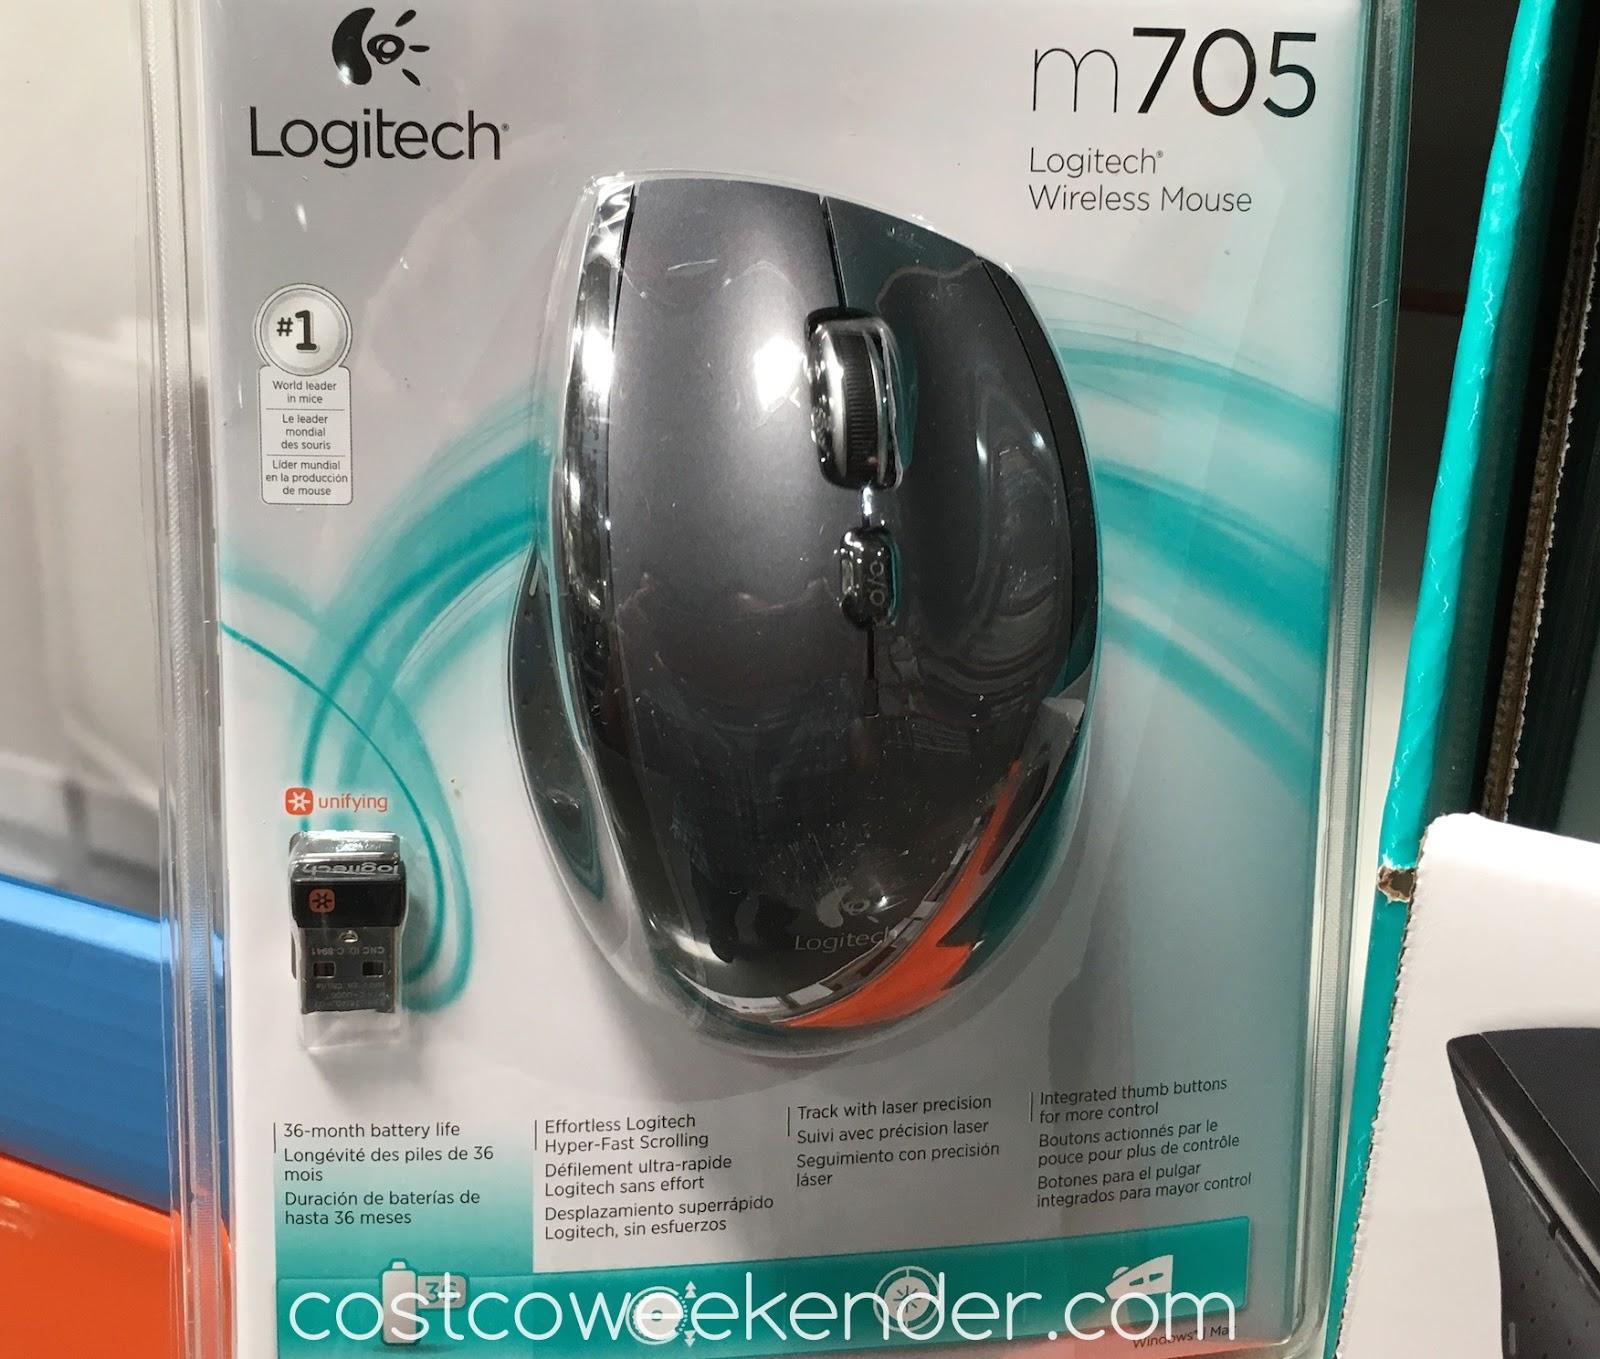 2161193cc06 Logitech m705 Marathon Wireless Mouse | Costco Weekender